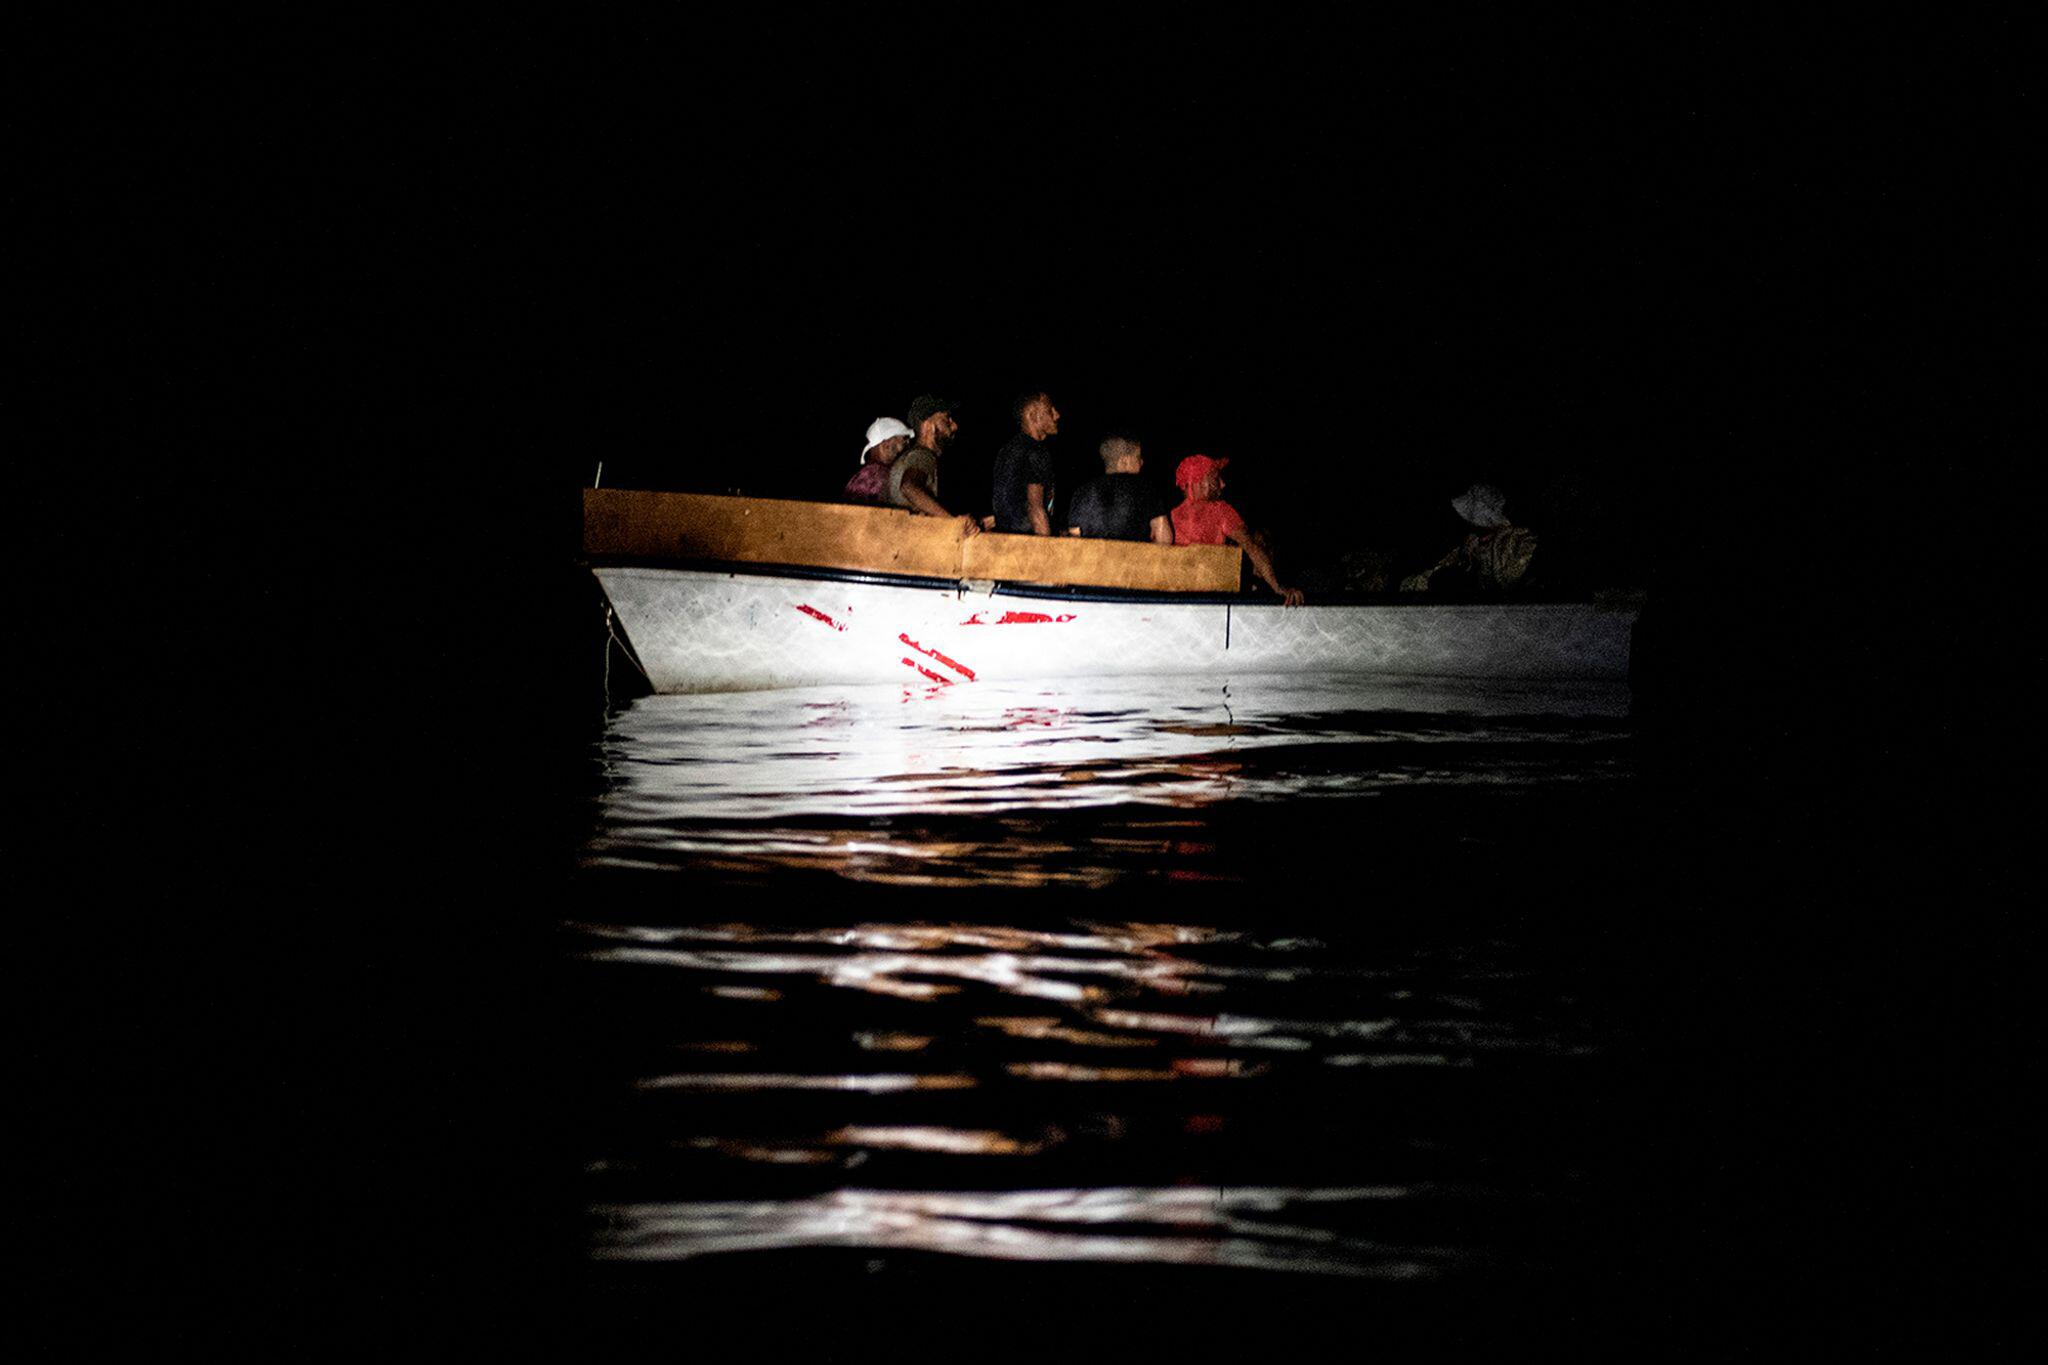 Bild zu Migrantion - «Ocean Viking» im Mittelmeer